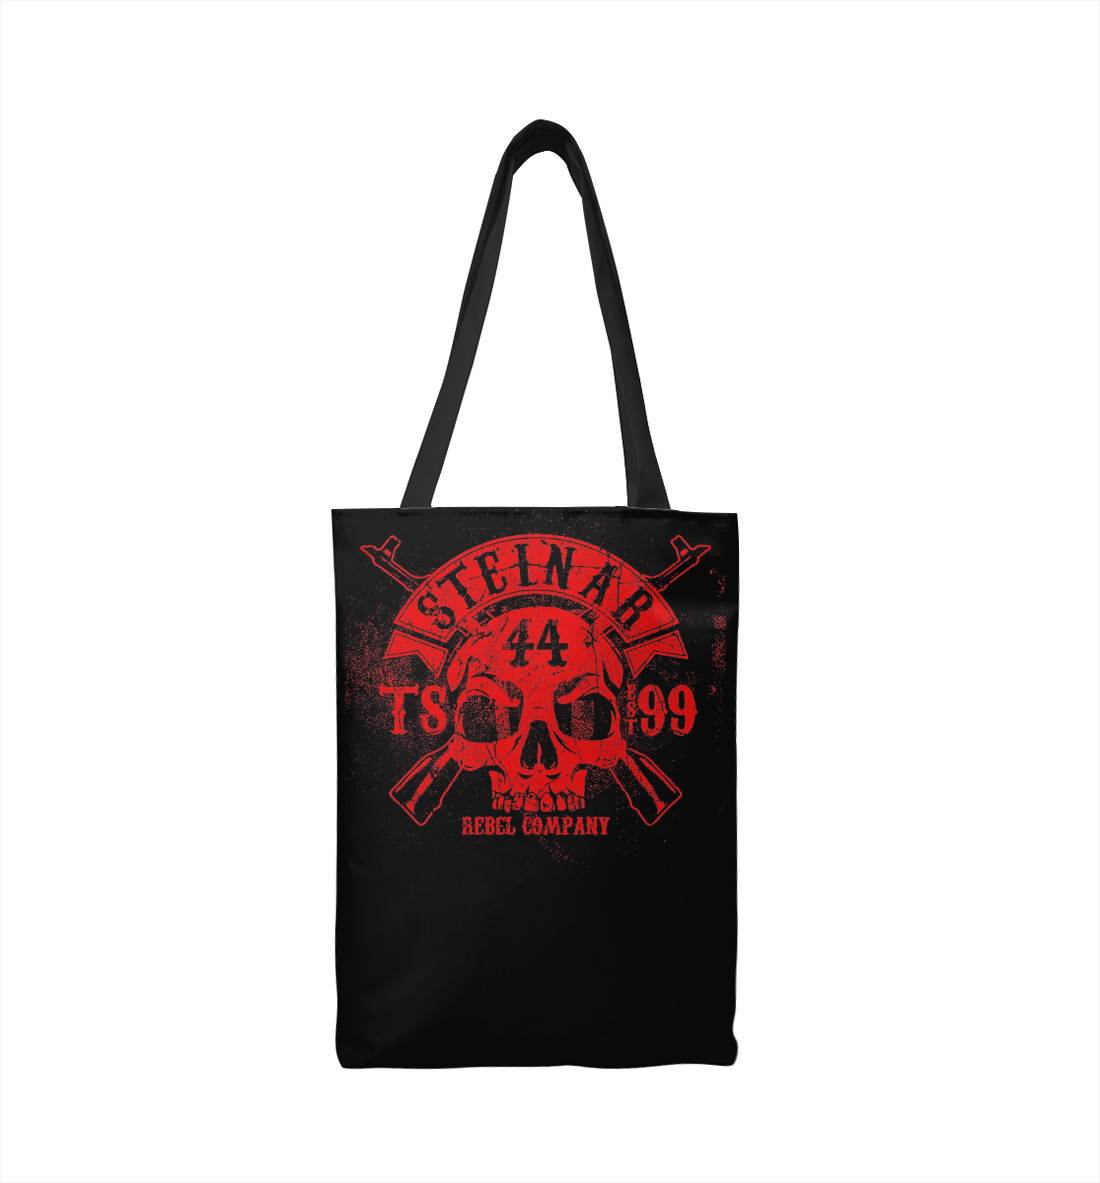 сумка printio thor steinar brand Thor Steinar бренд